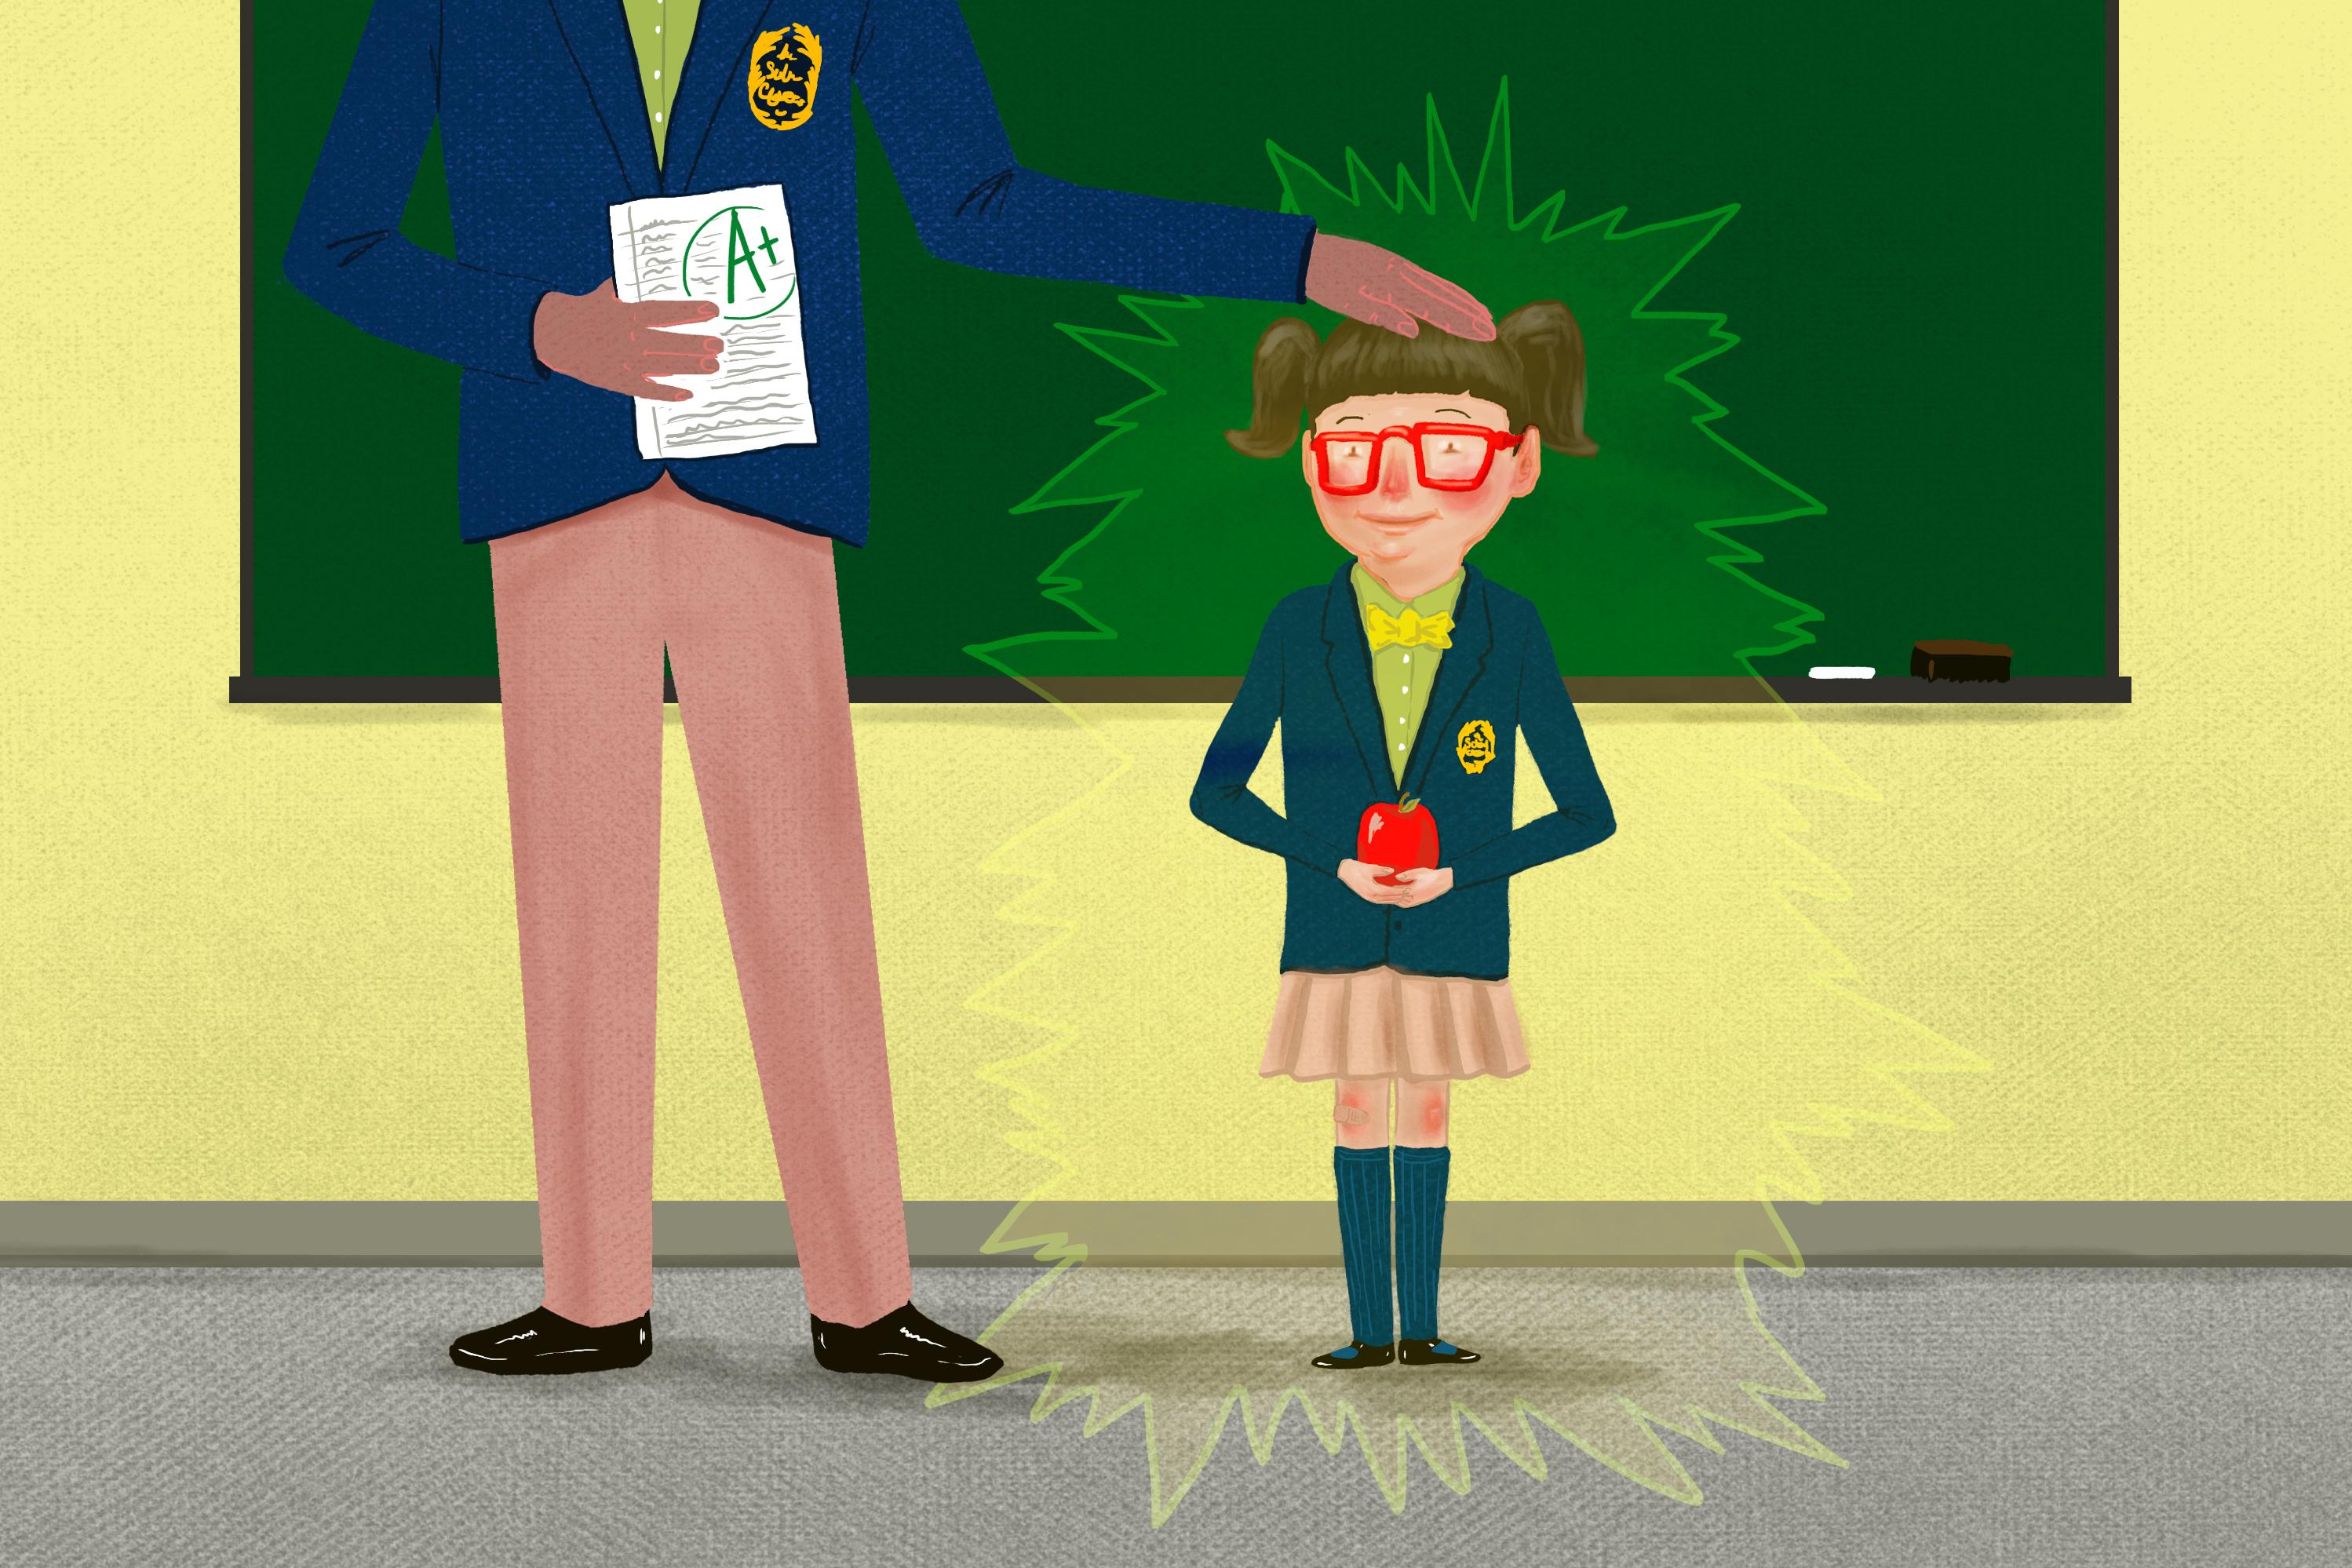 If Your Teacher Likes You, You Might Get A Better Grade : NPR Ed : NPR